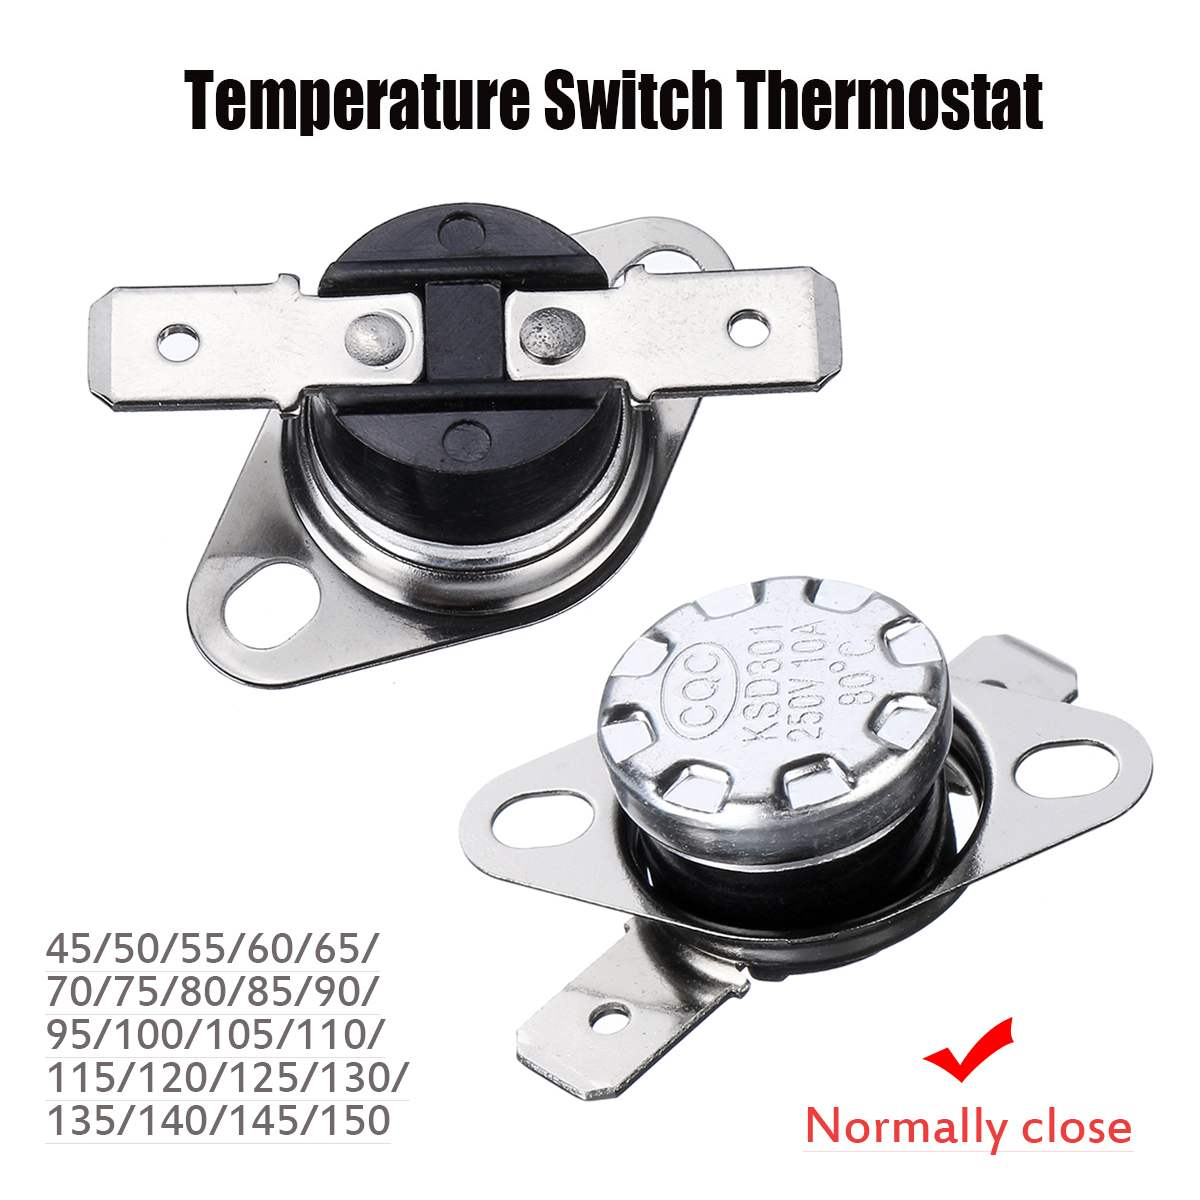 KSD301 Temperature Switch Control Sensor Thermal Thermostat 115°C N.O